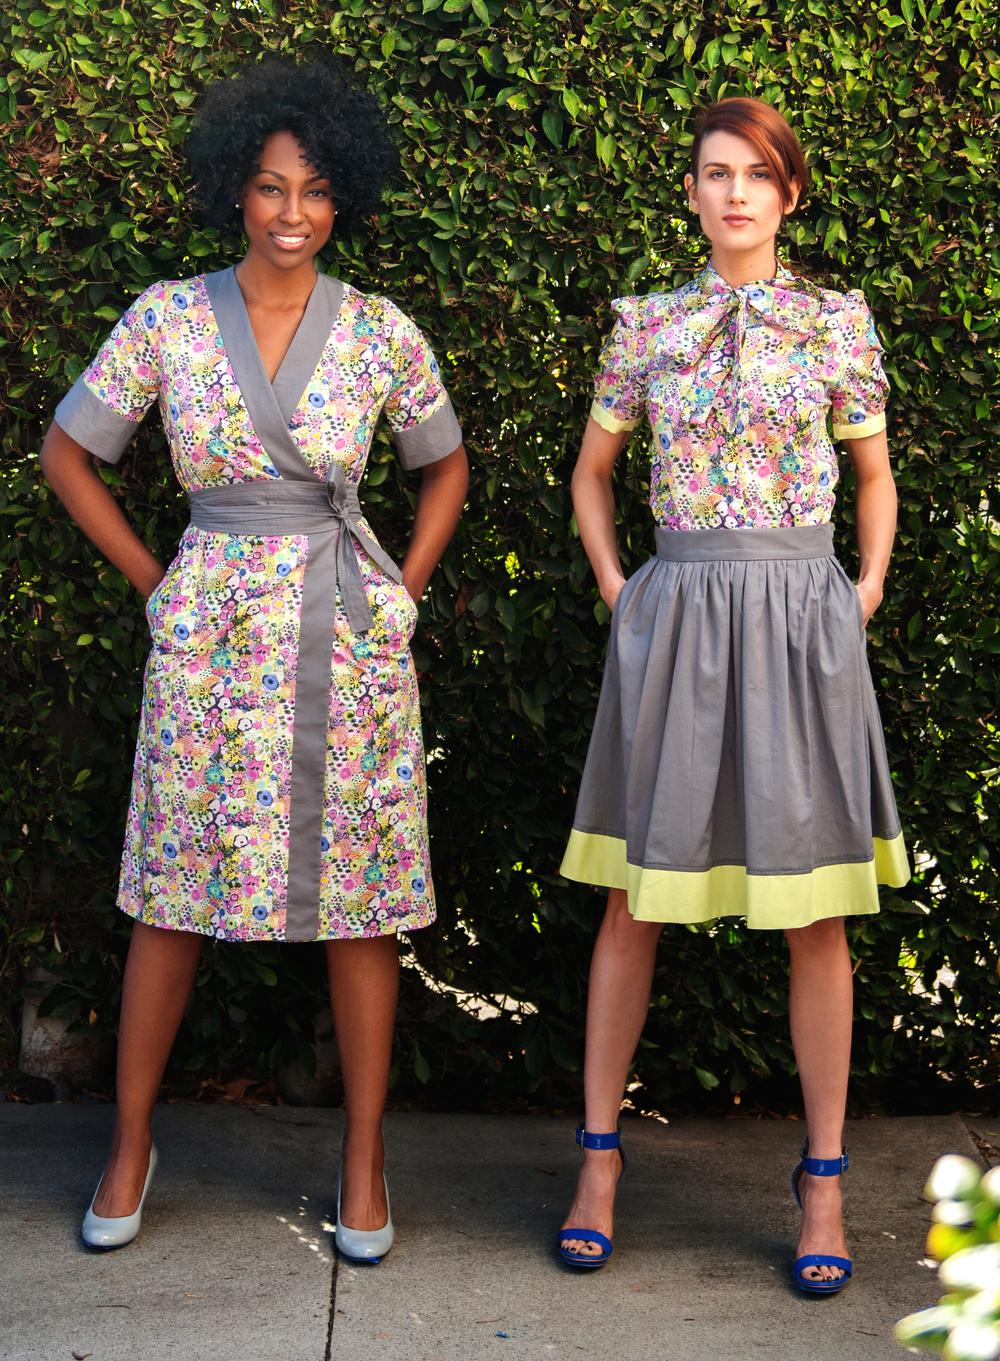 Kimono Dress, Bow-Tied Shirt & Dirndl Skirt